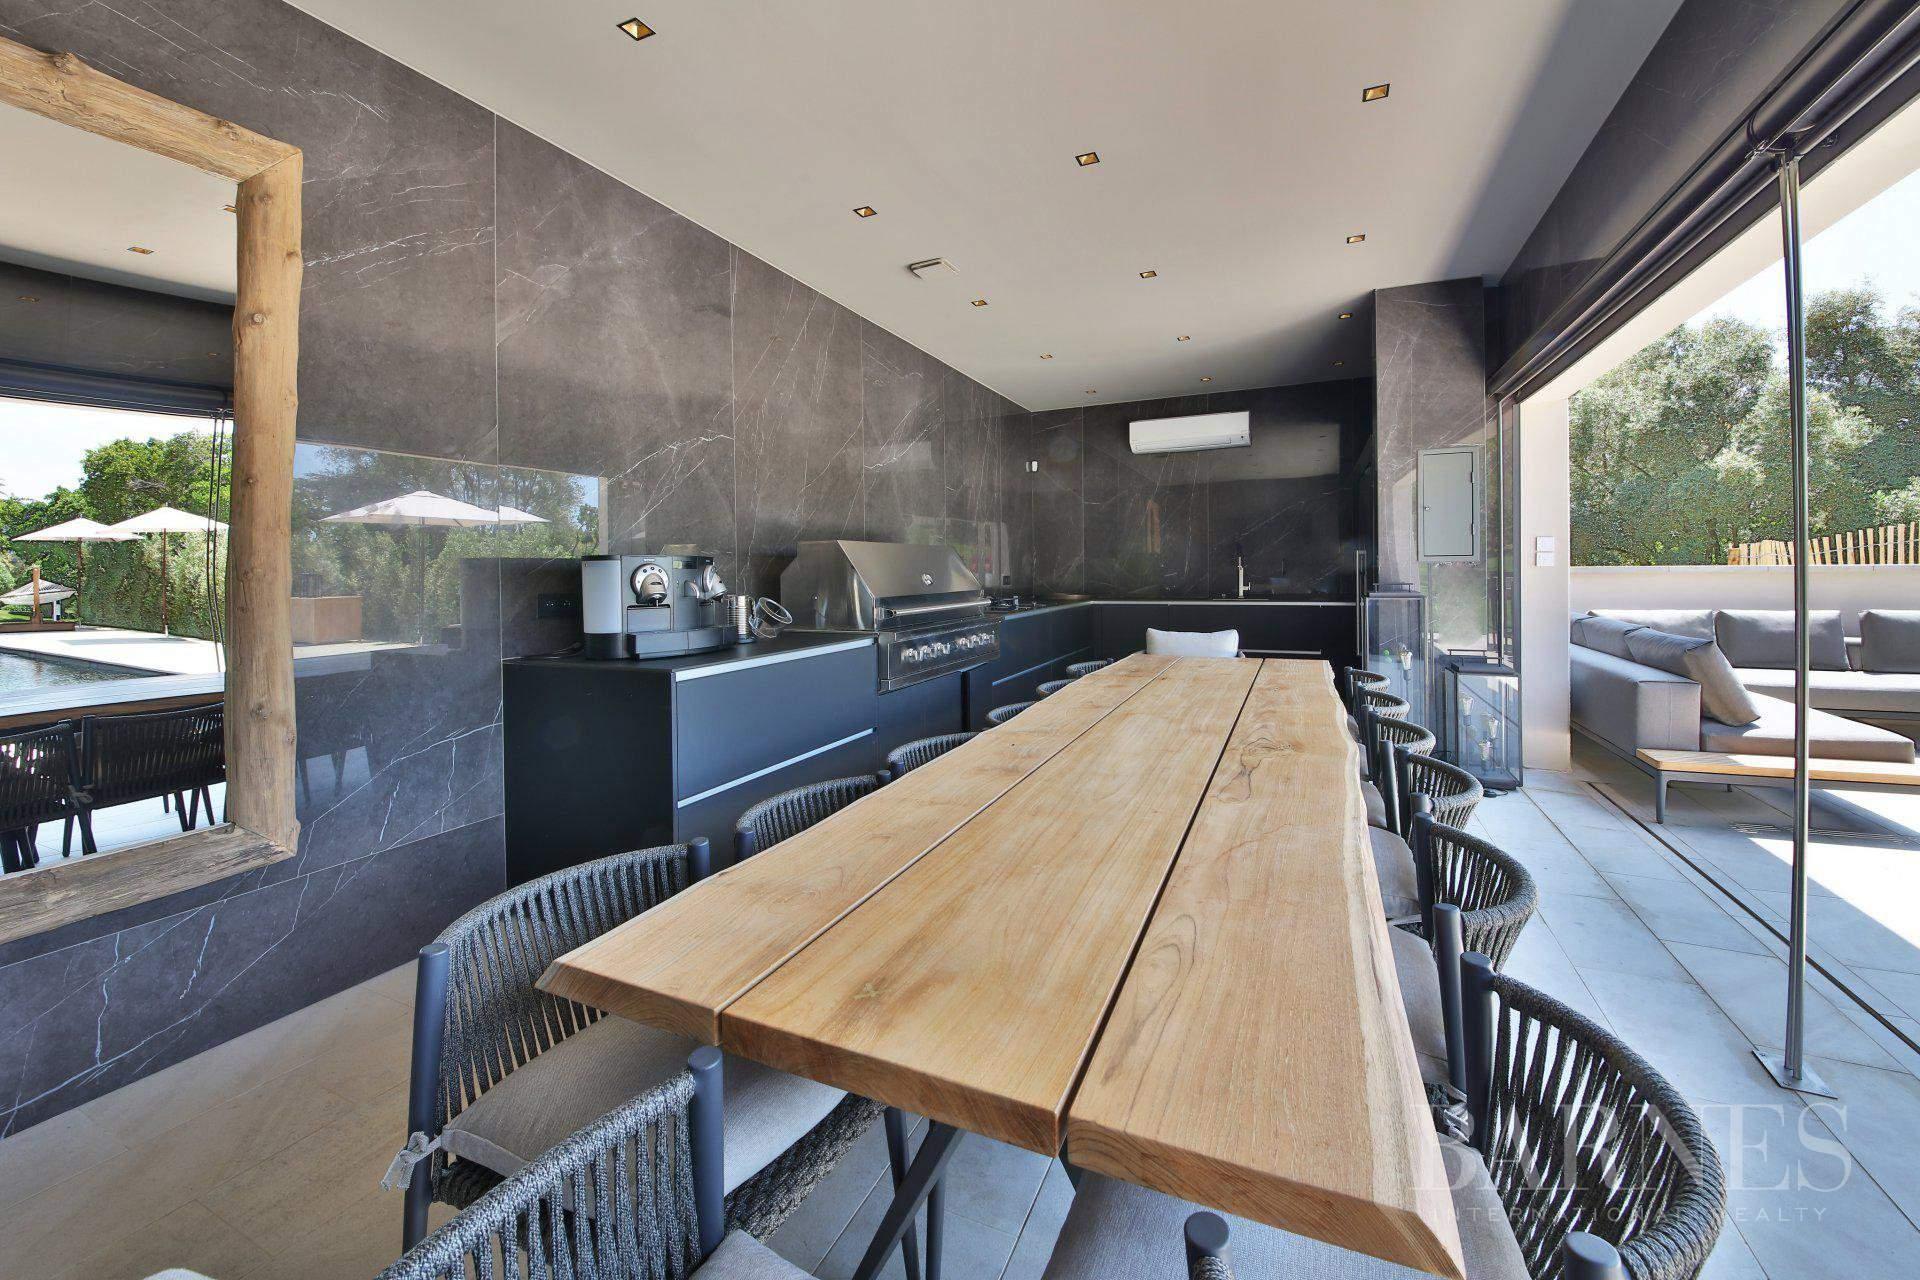 GOLFE DE SAINT-TROPEZ - Gigaro - Villa luxueuse - 11 chambres picture 5